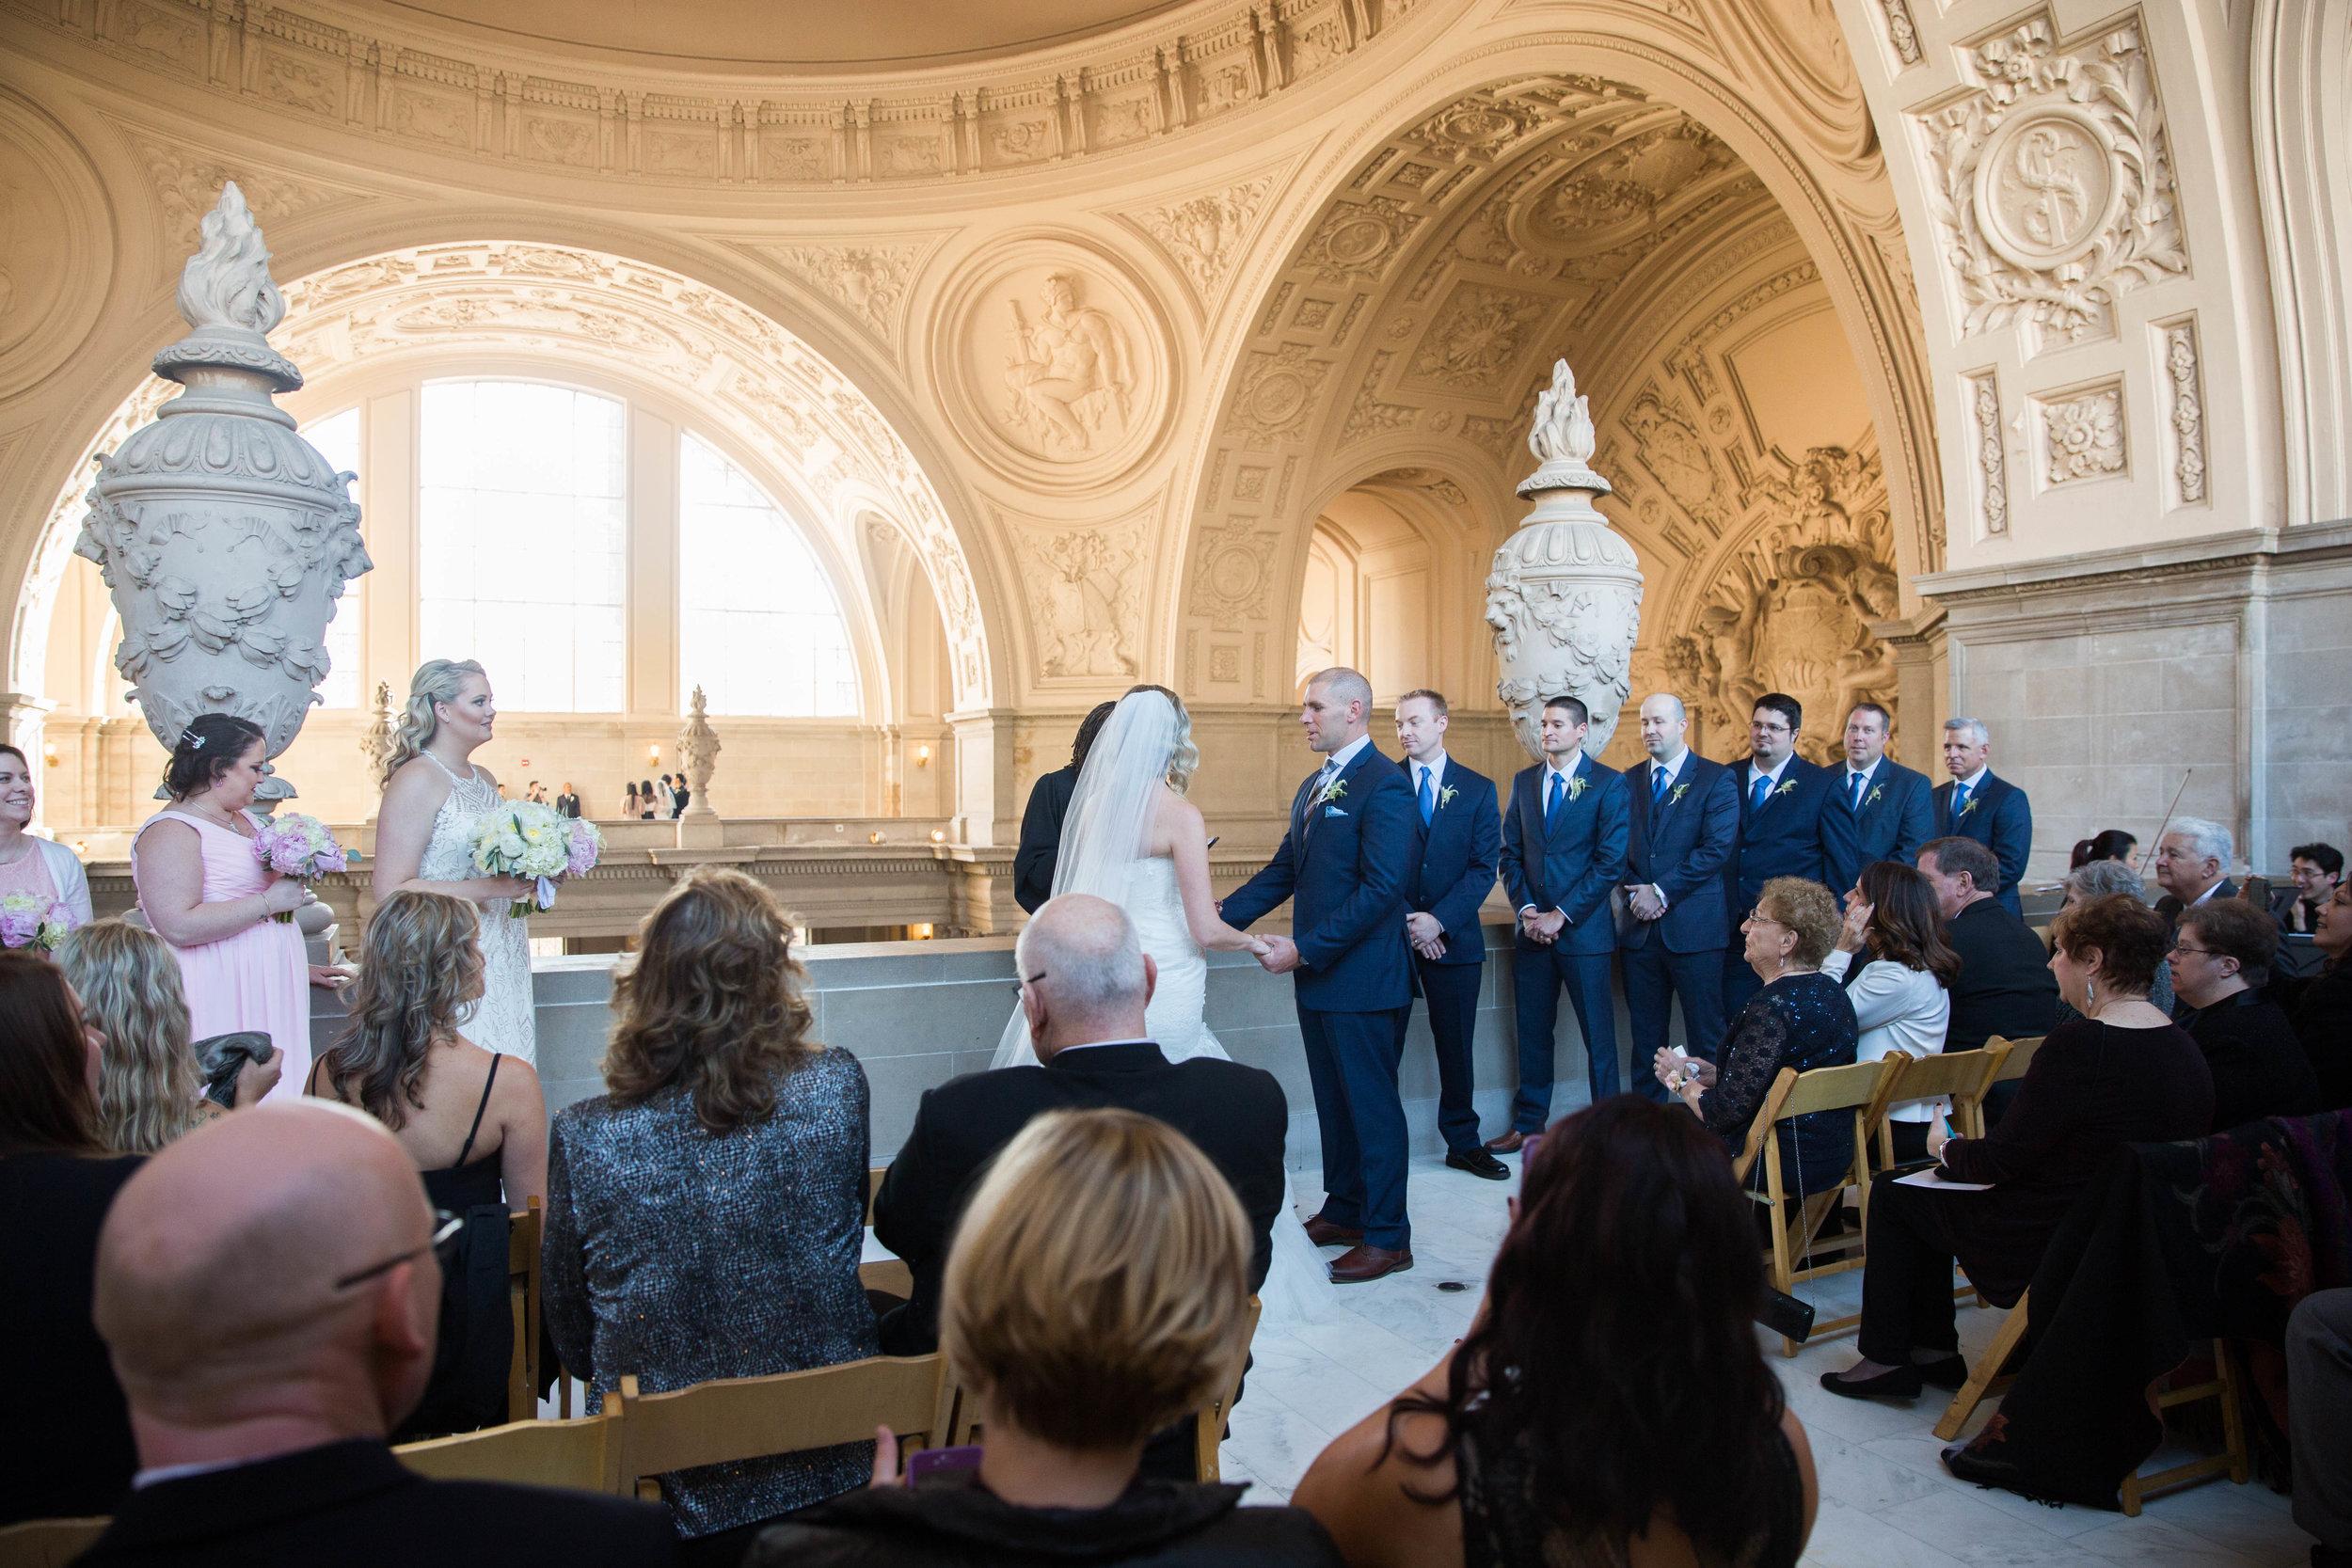 san-francisco-city-hall-wedding-kimberly-macdonald-photography596 copy.jpg